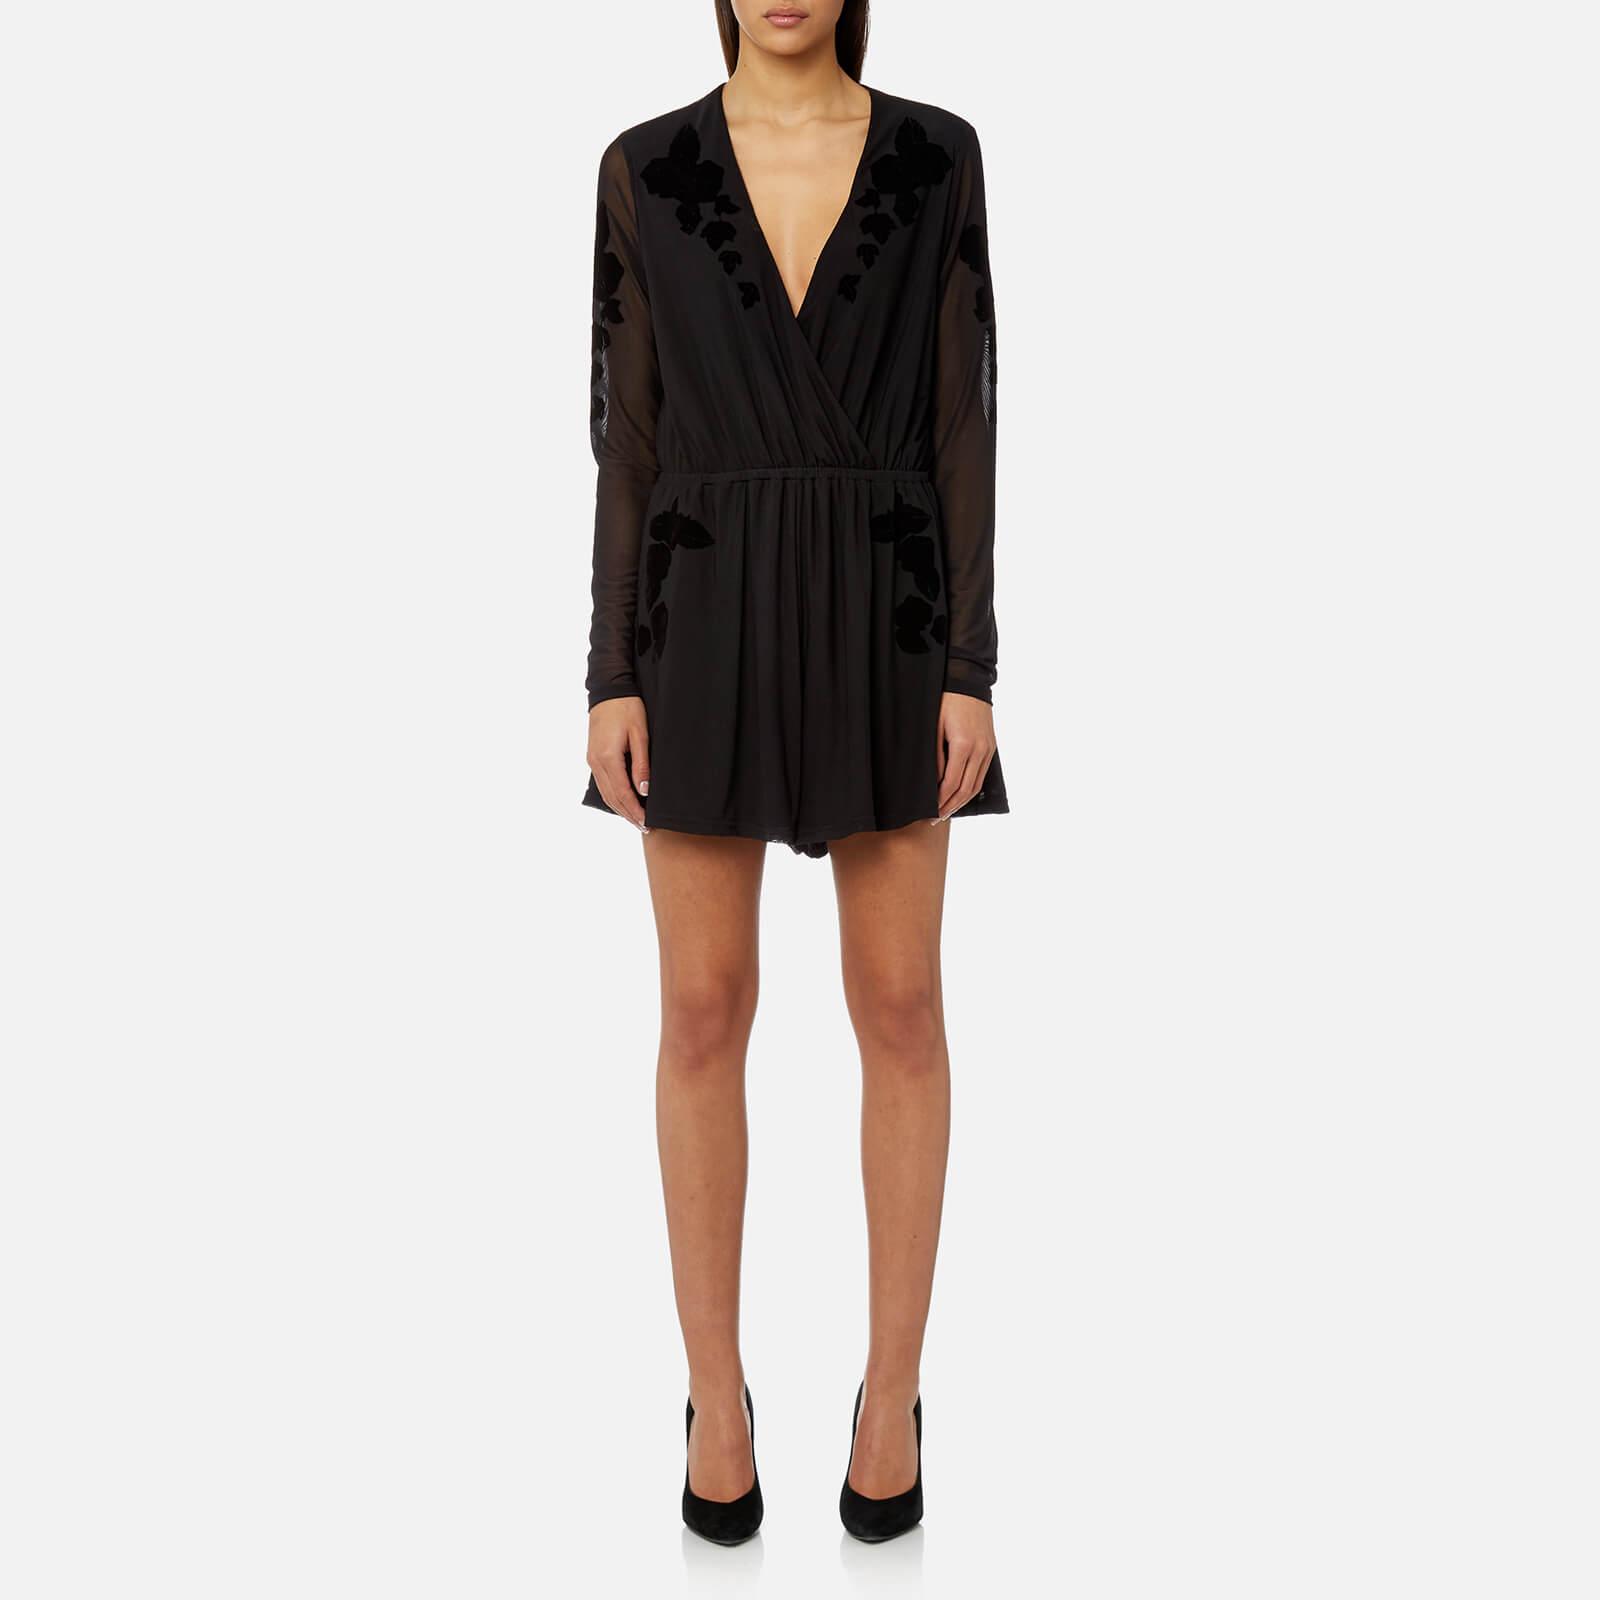 26fc396046 MINKPINK Women s Drifters Flocked Mesh Playsuit - Black Womens Clothing